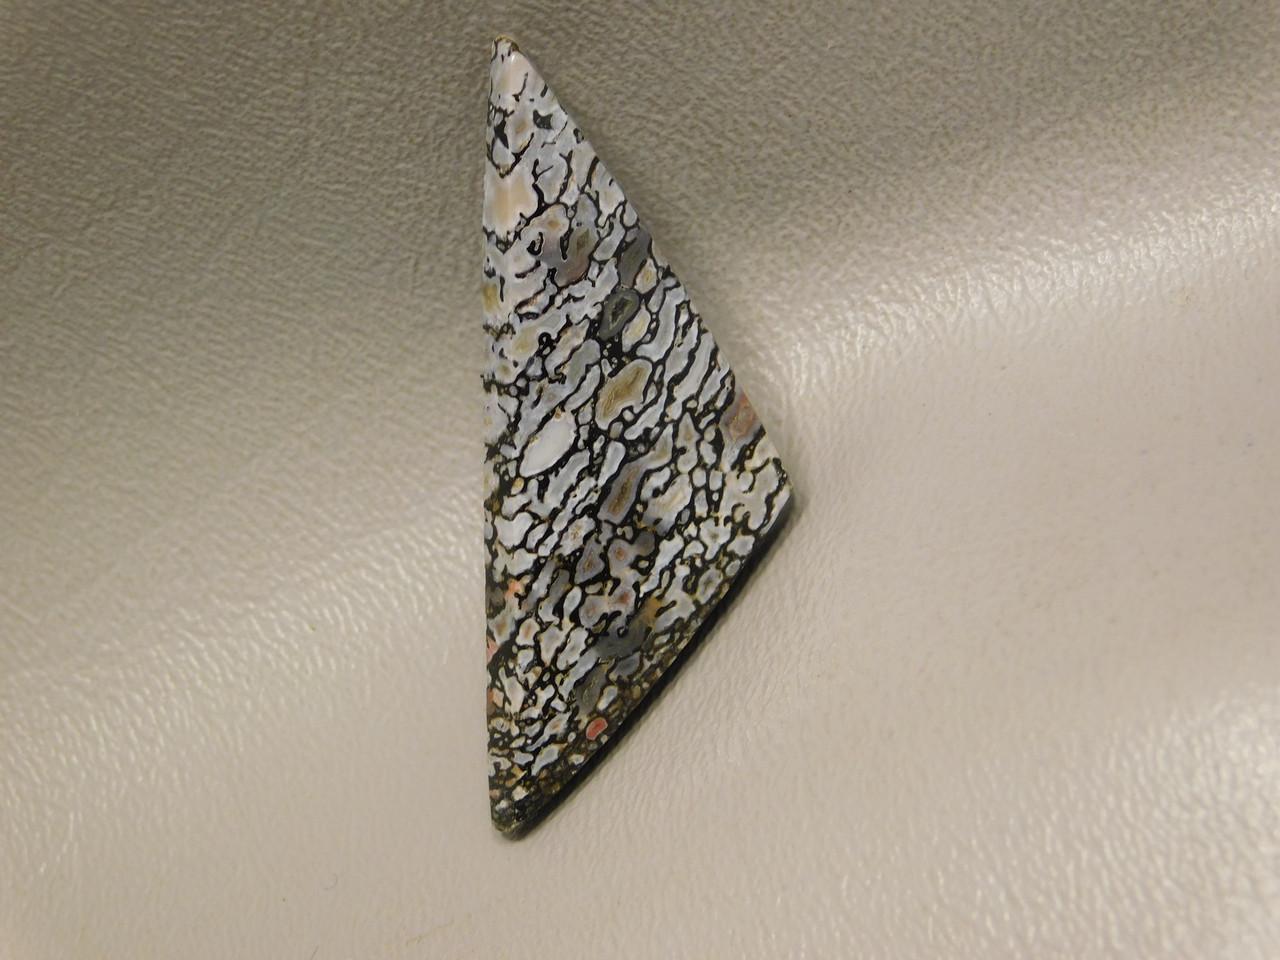 Natural Petrified Dinosaur Bone Cabochon Fossil Triangle Stone #12